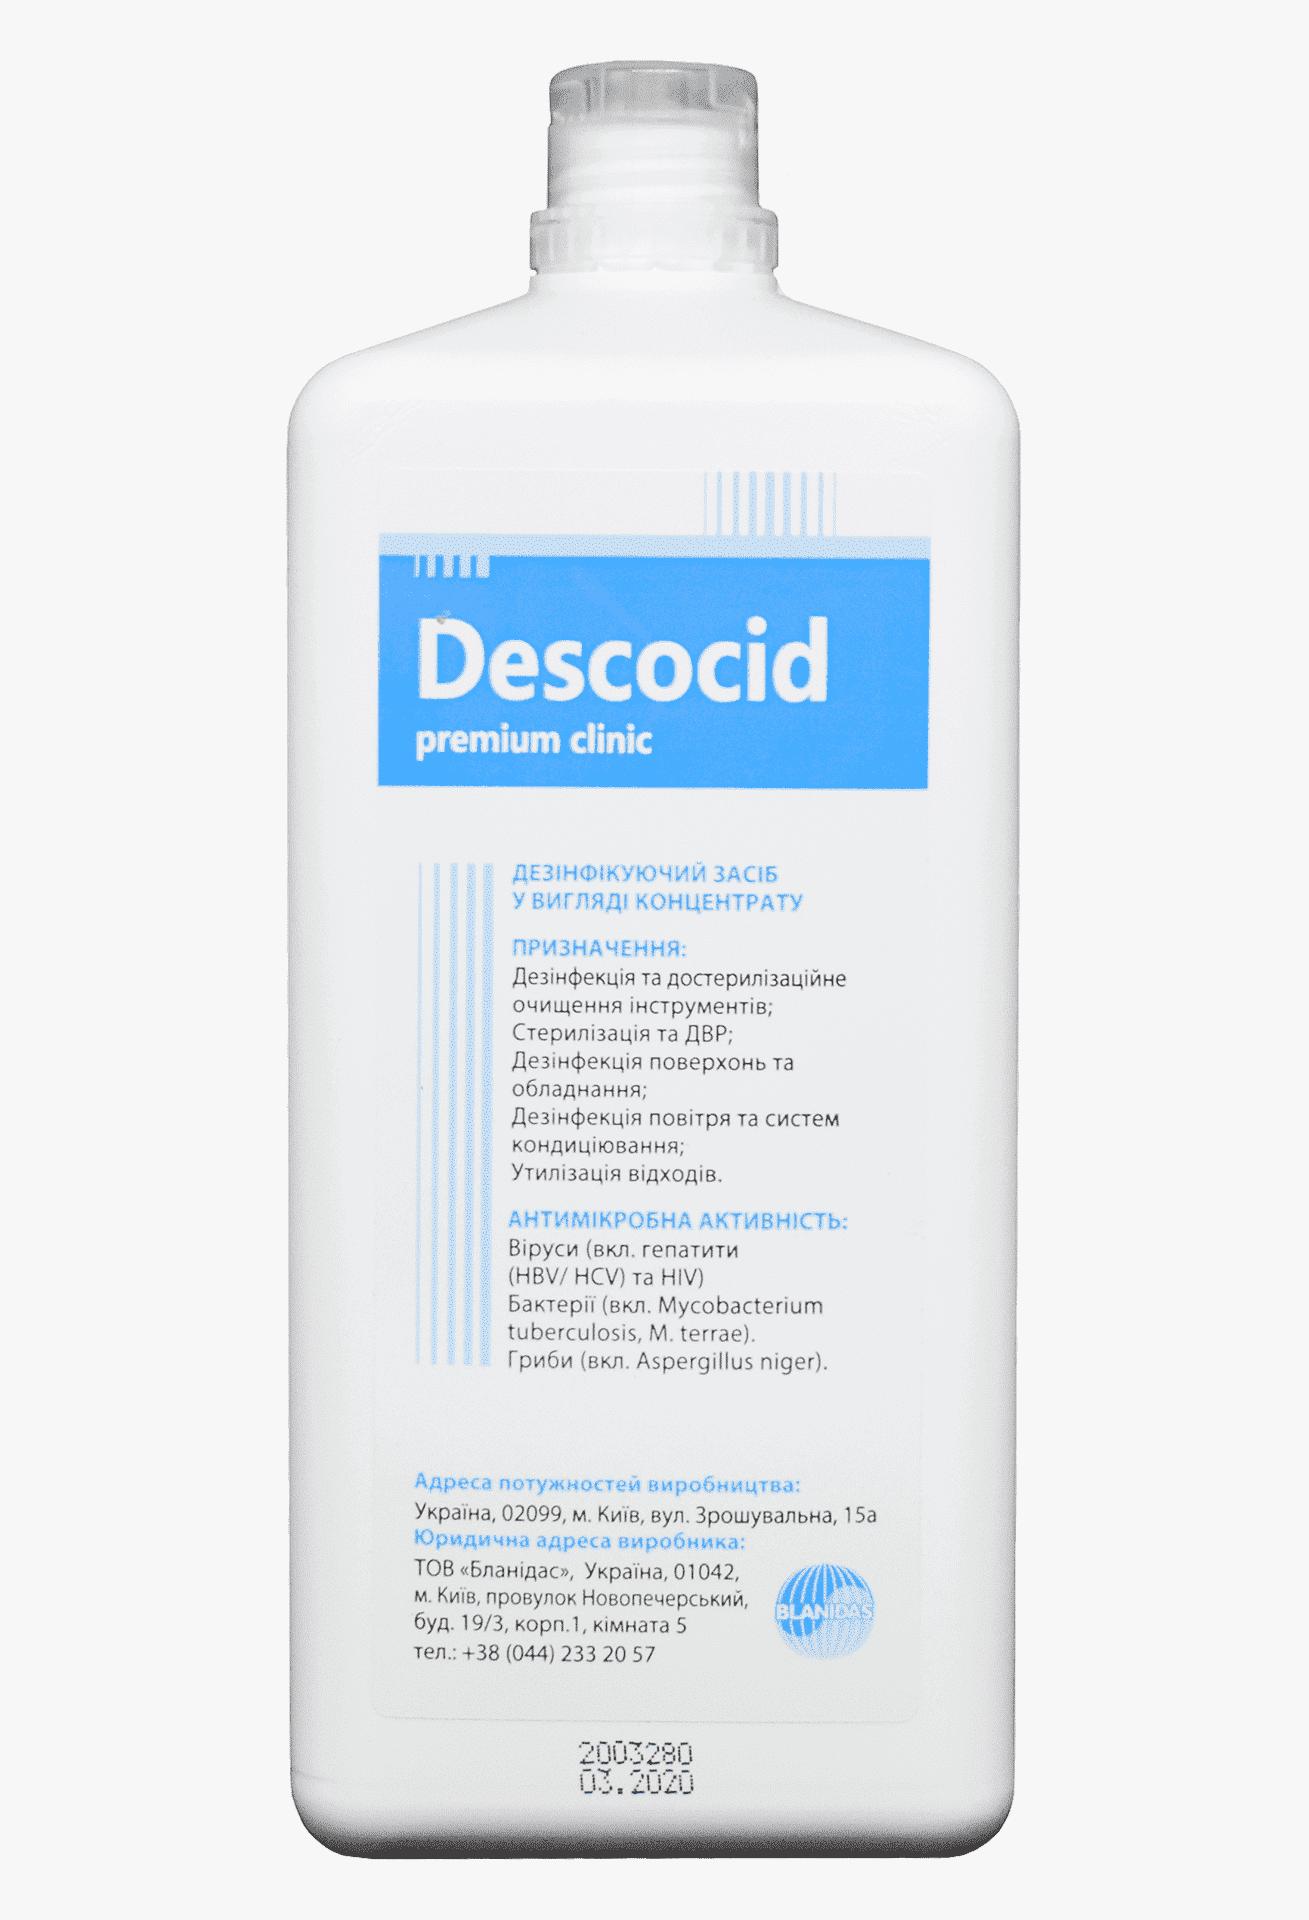 Дескоцид преміум клінік, 1л